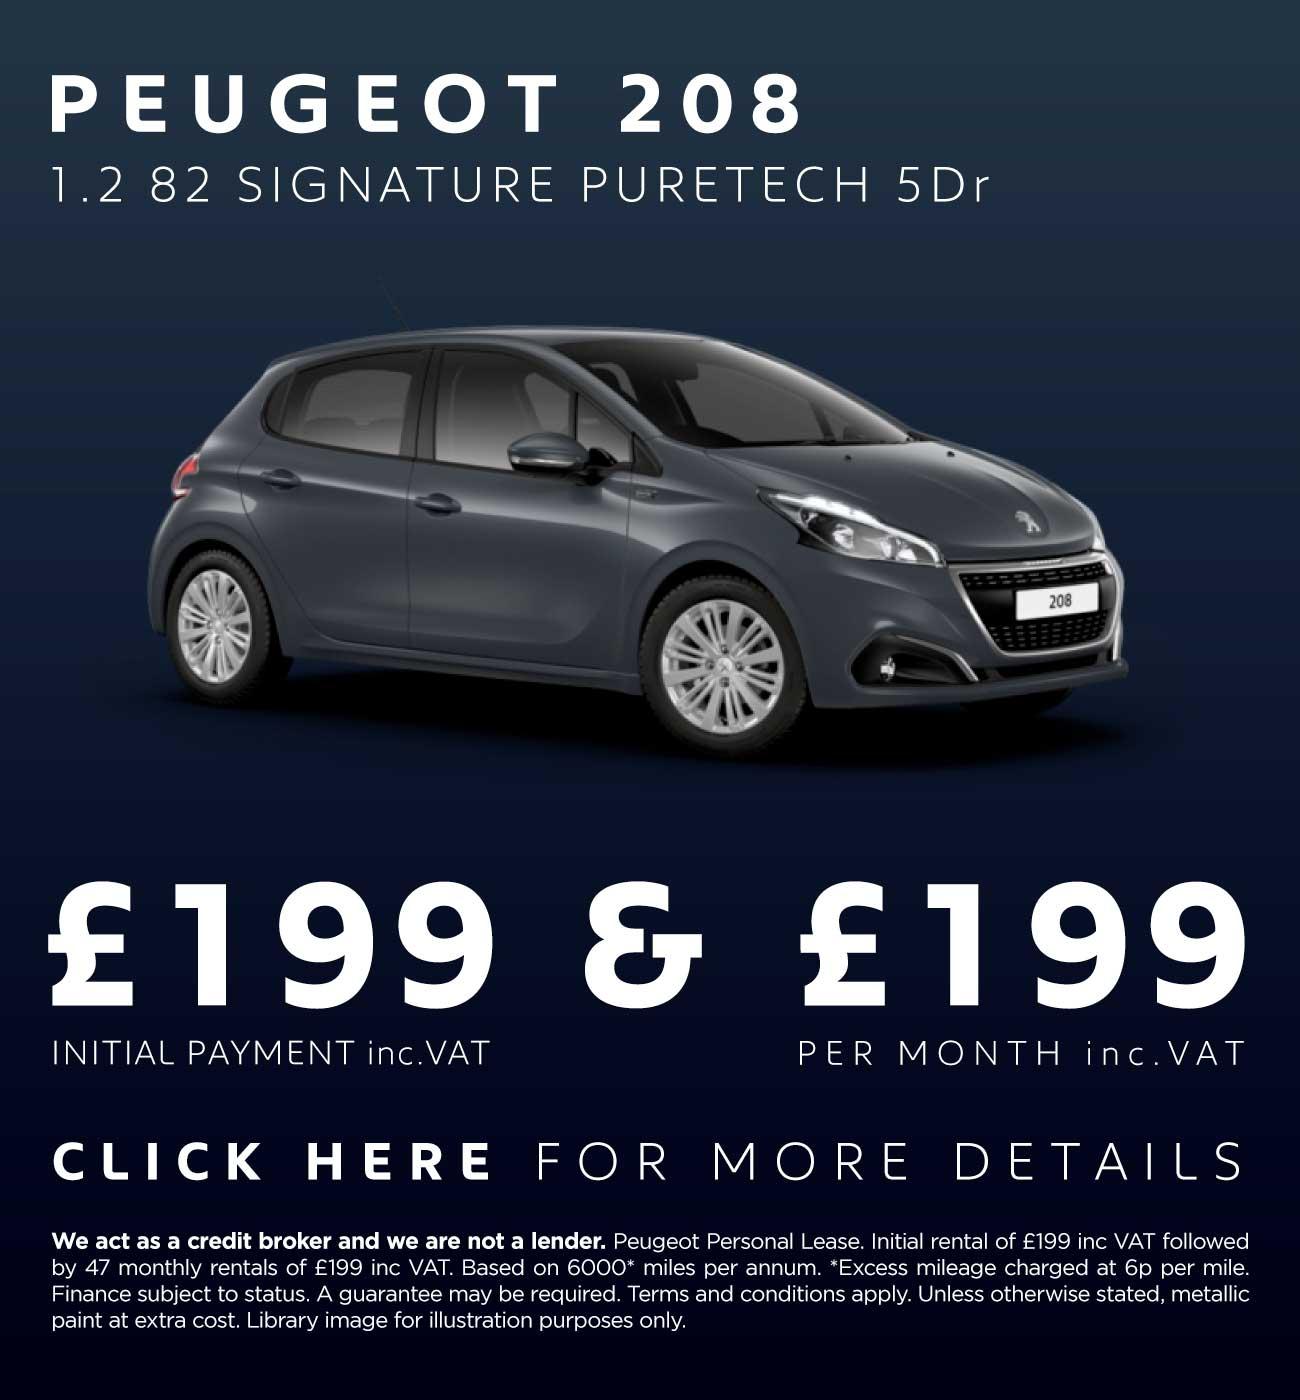 peugeot 208 deals new peugeot 208 cars for sale macklin motors. Black Bedroom Furniture Sets. Home Design Ideas